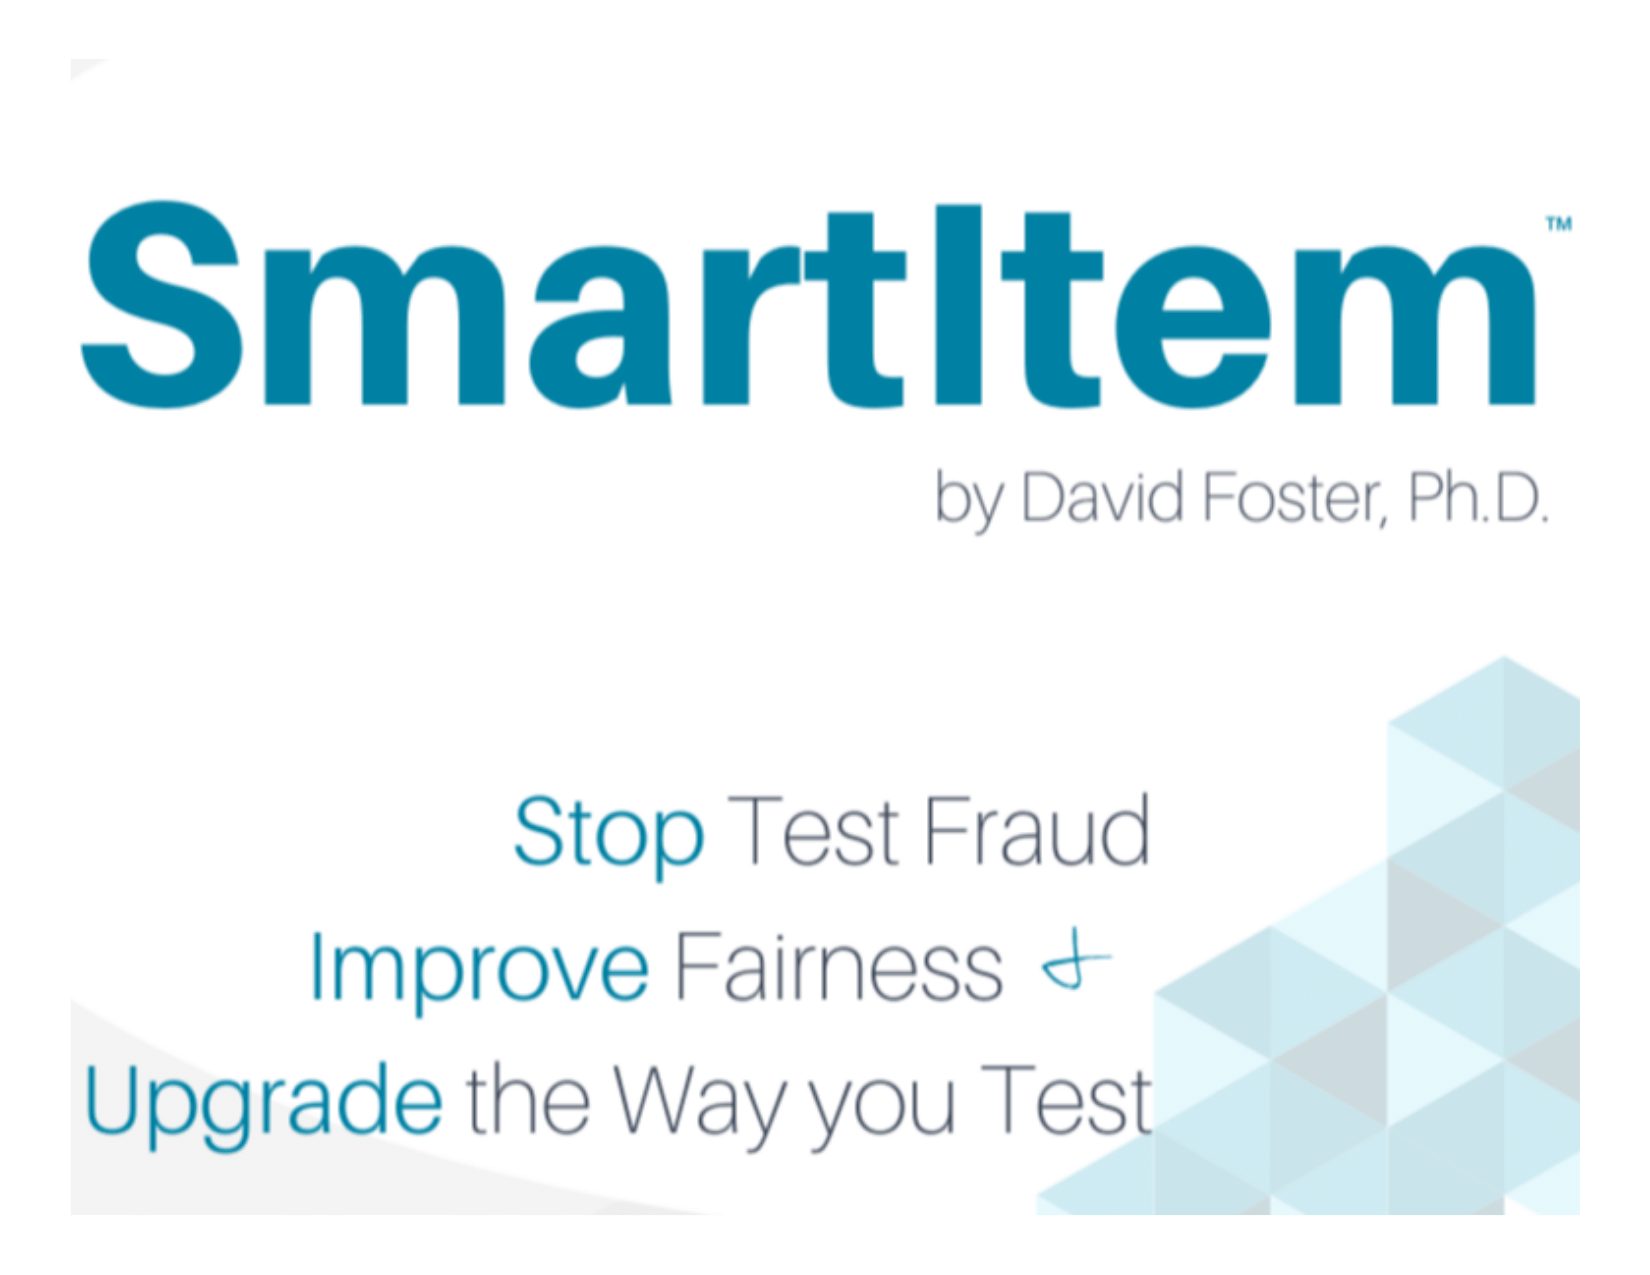 SmartItem Book by David Foster, Ph.D.